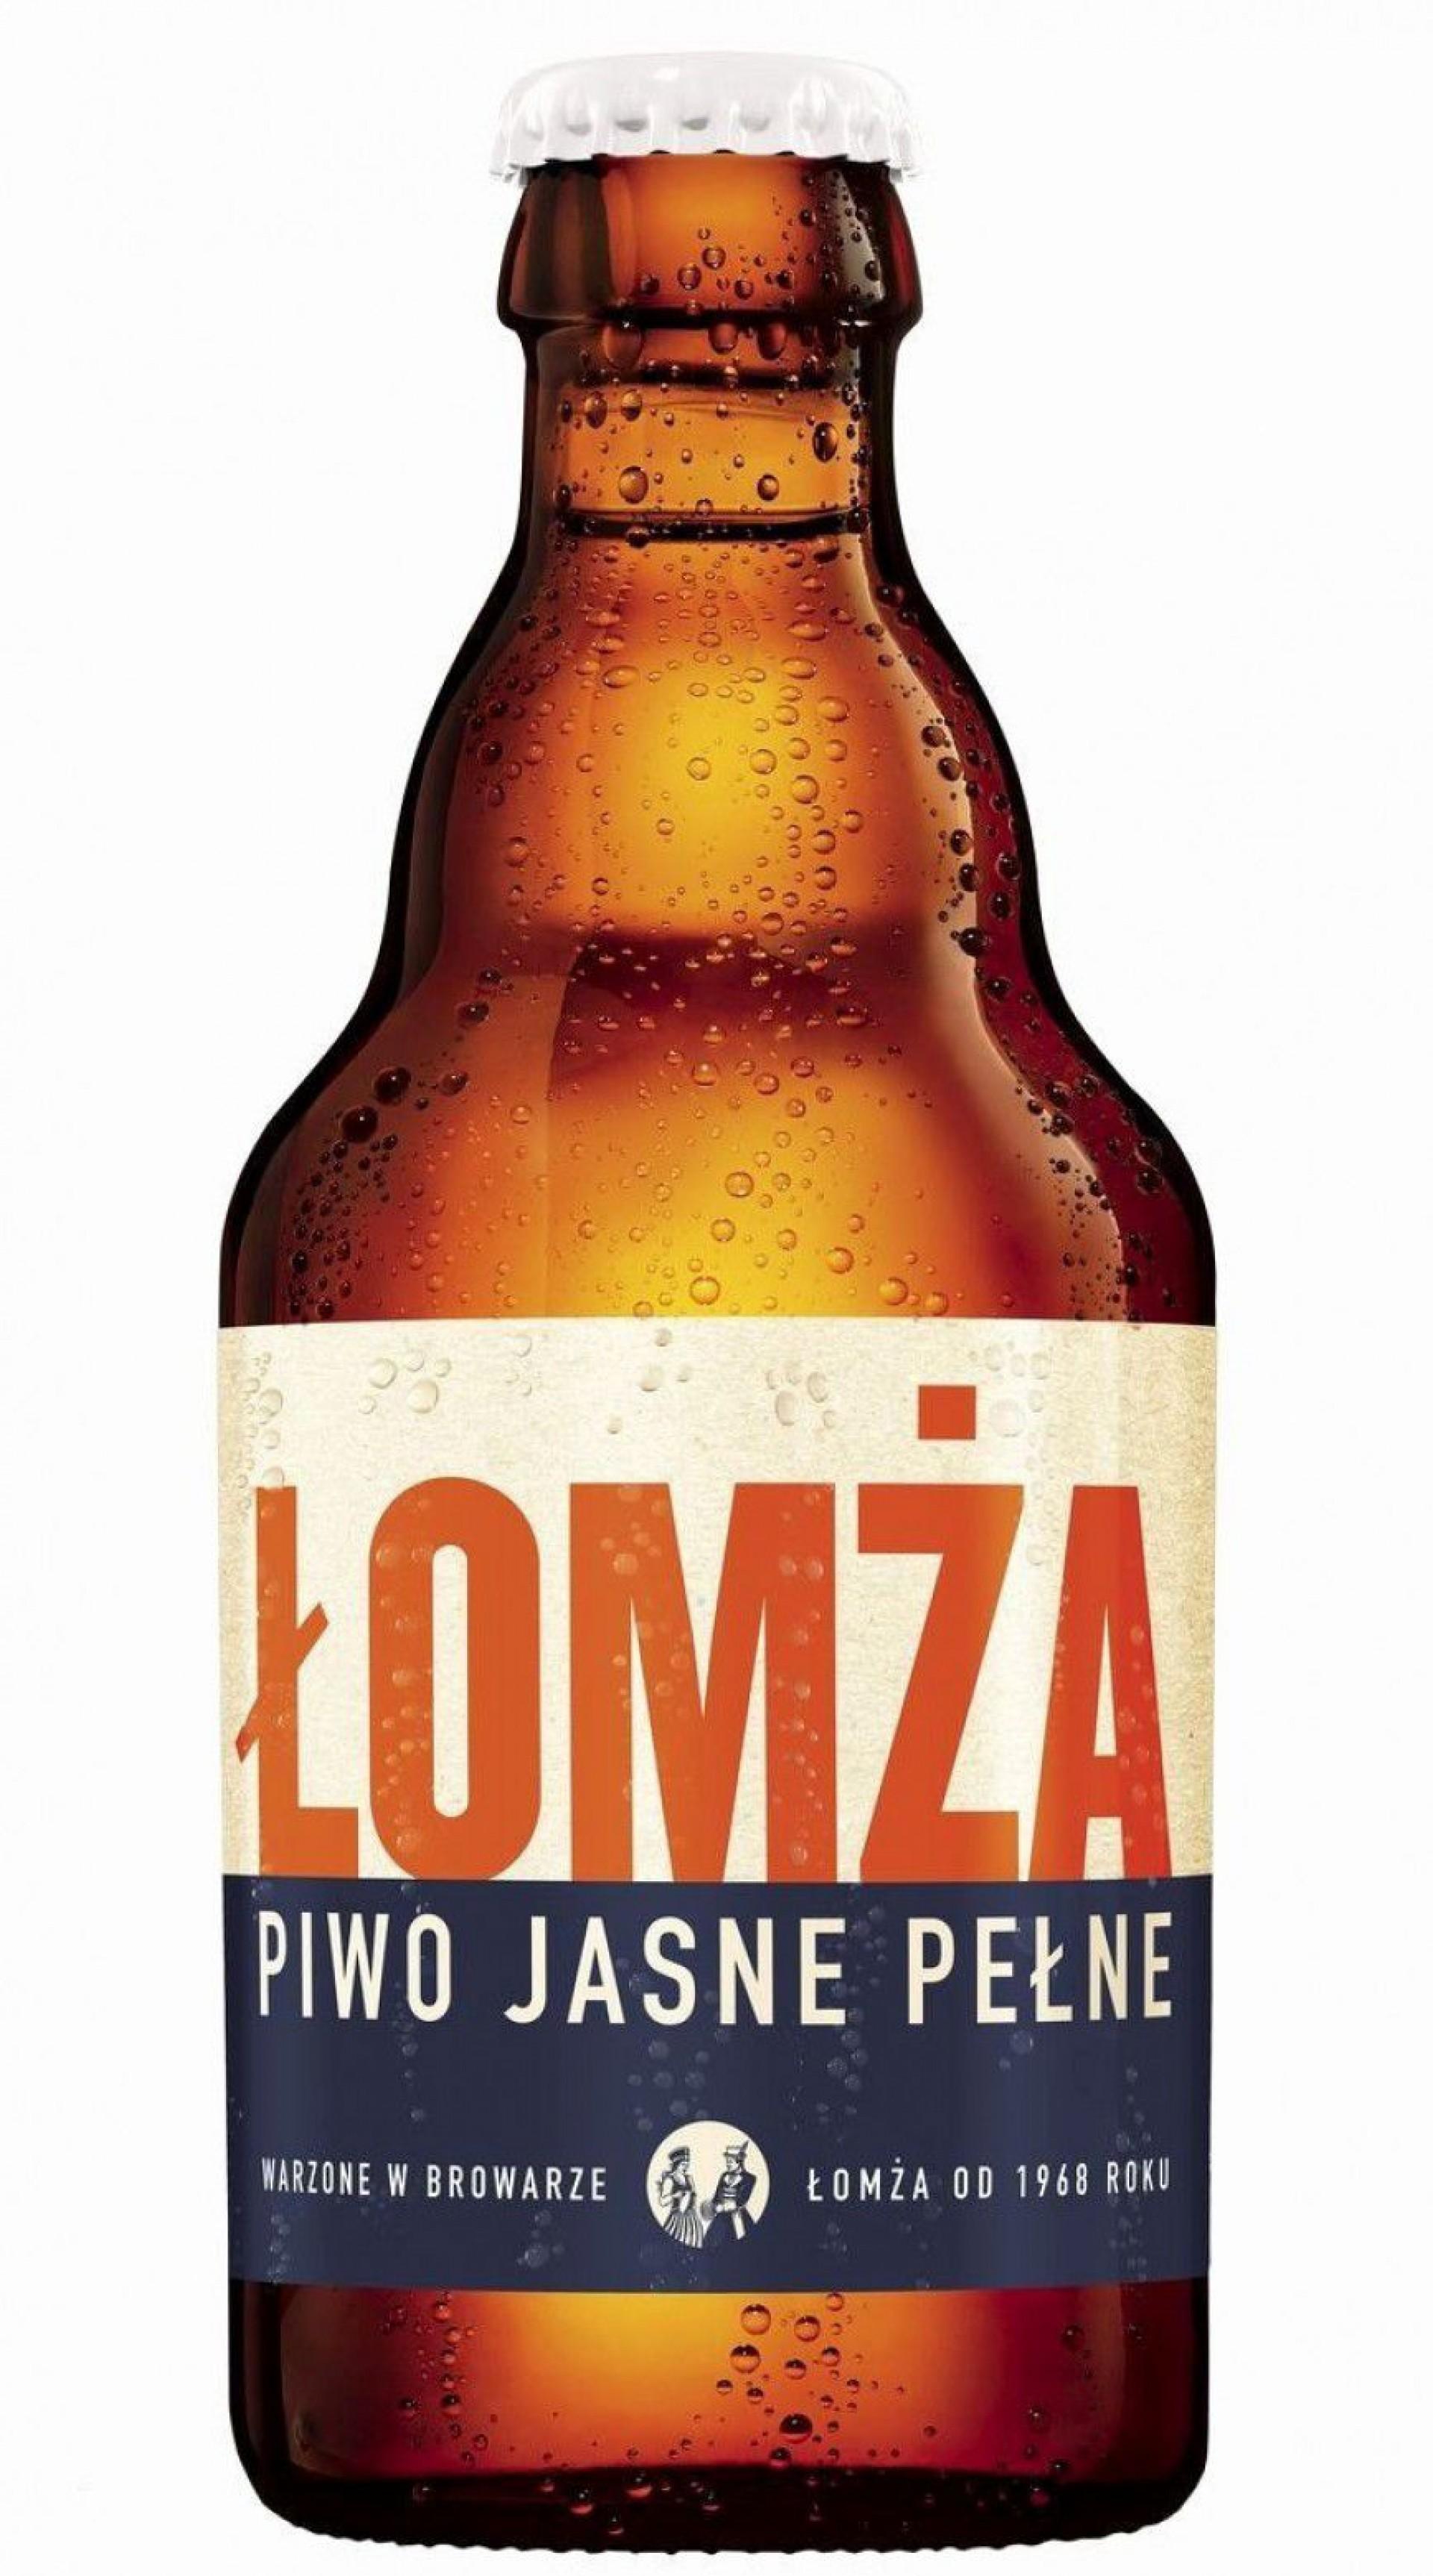 002 Shocking Beer Bottle Label Template Word Inspiration  Free1920